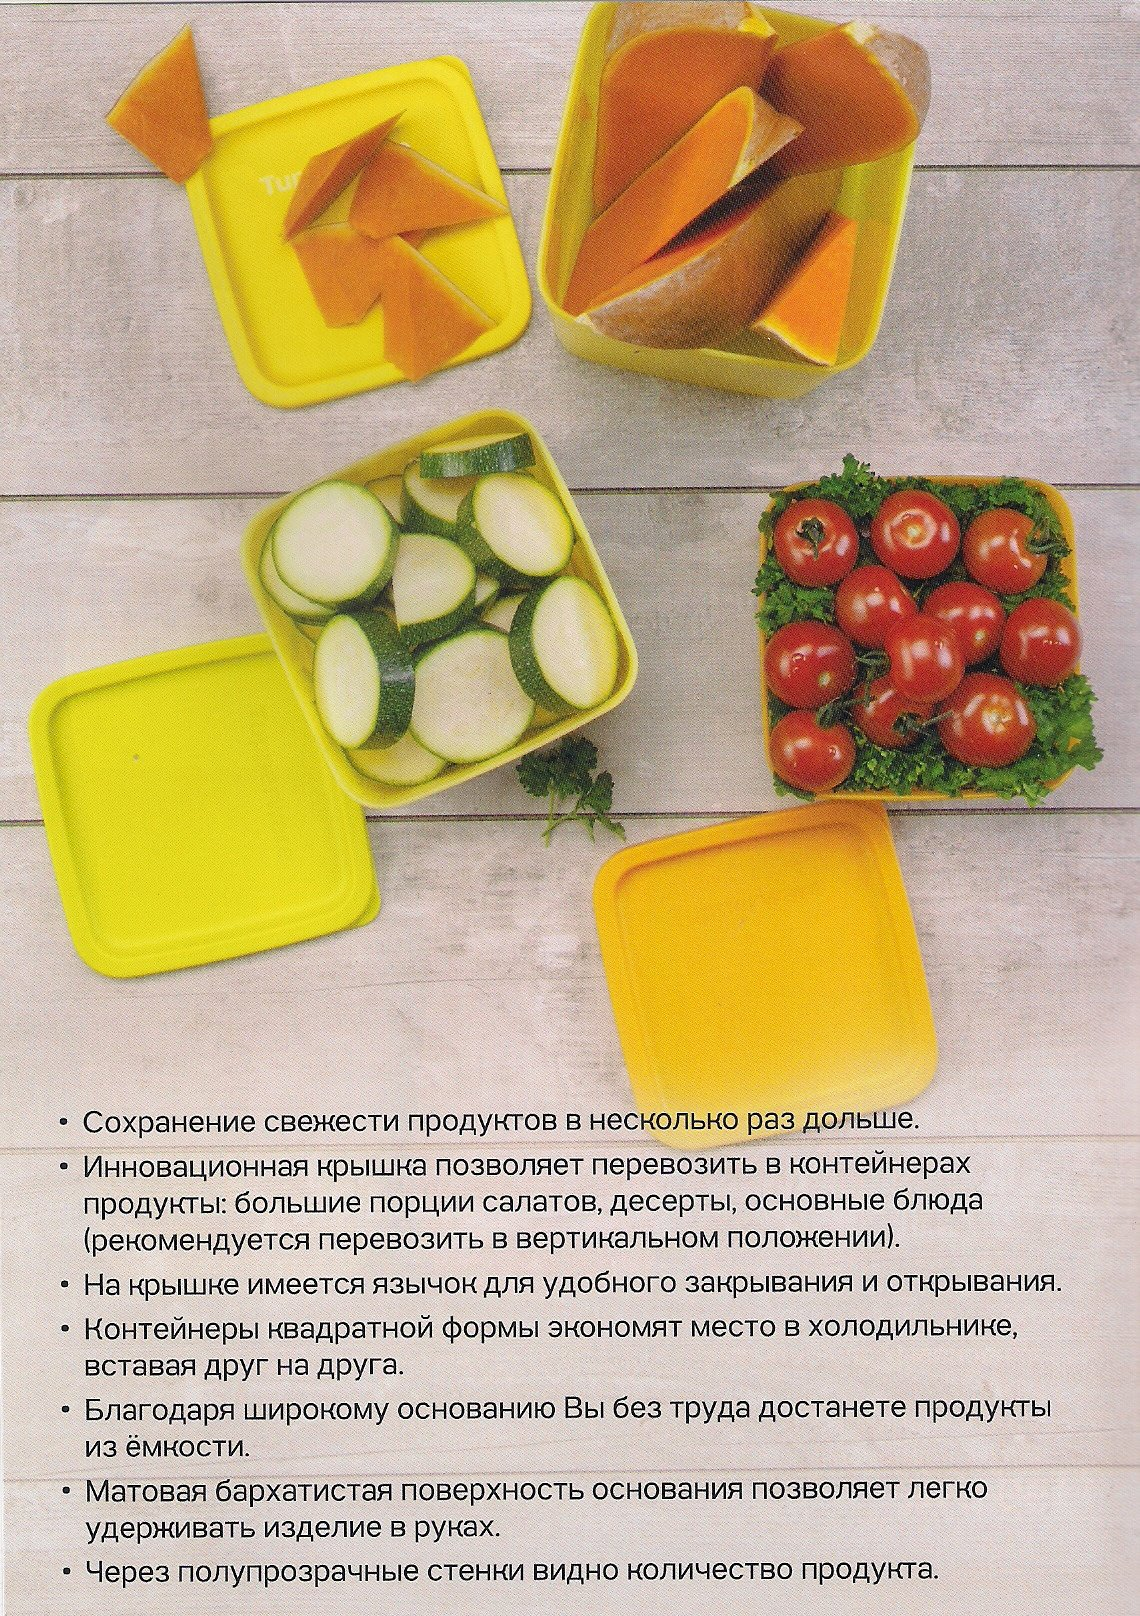 https://tupperware-online.ru/images/upload/4g.jpg